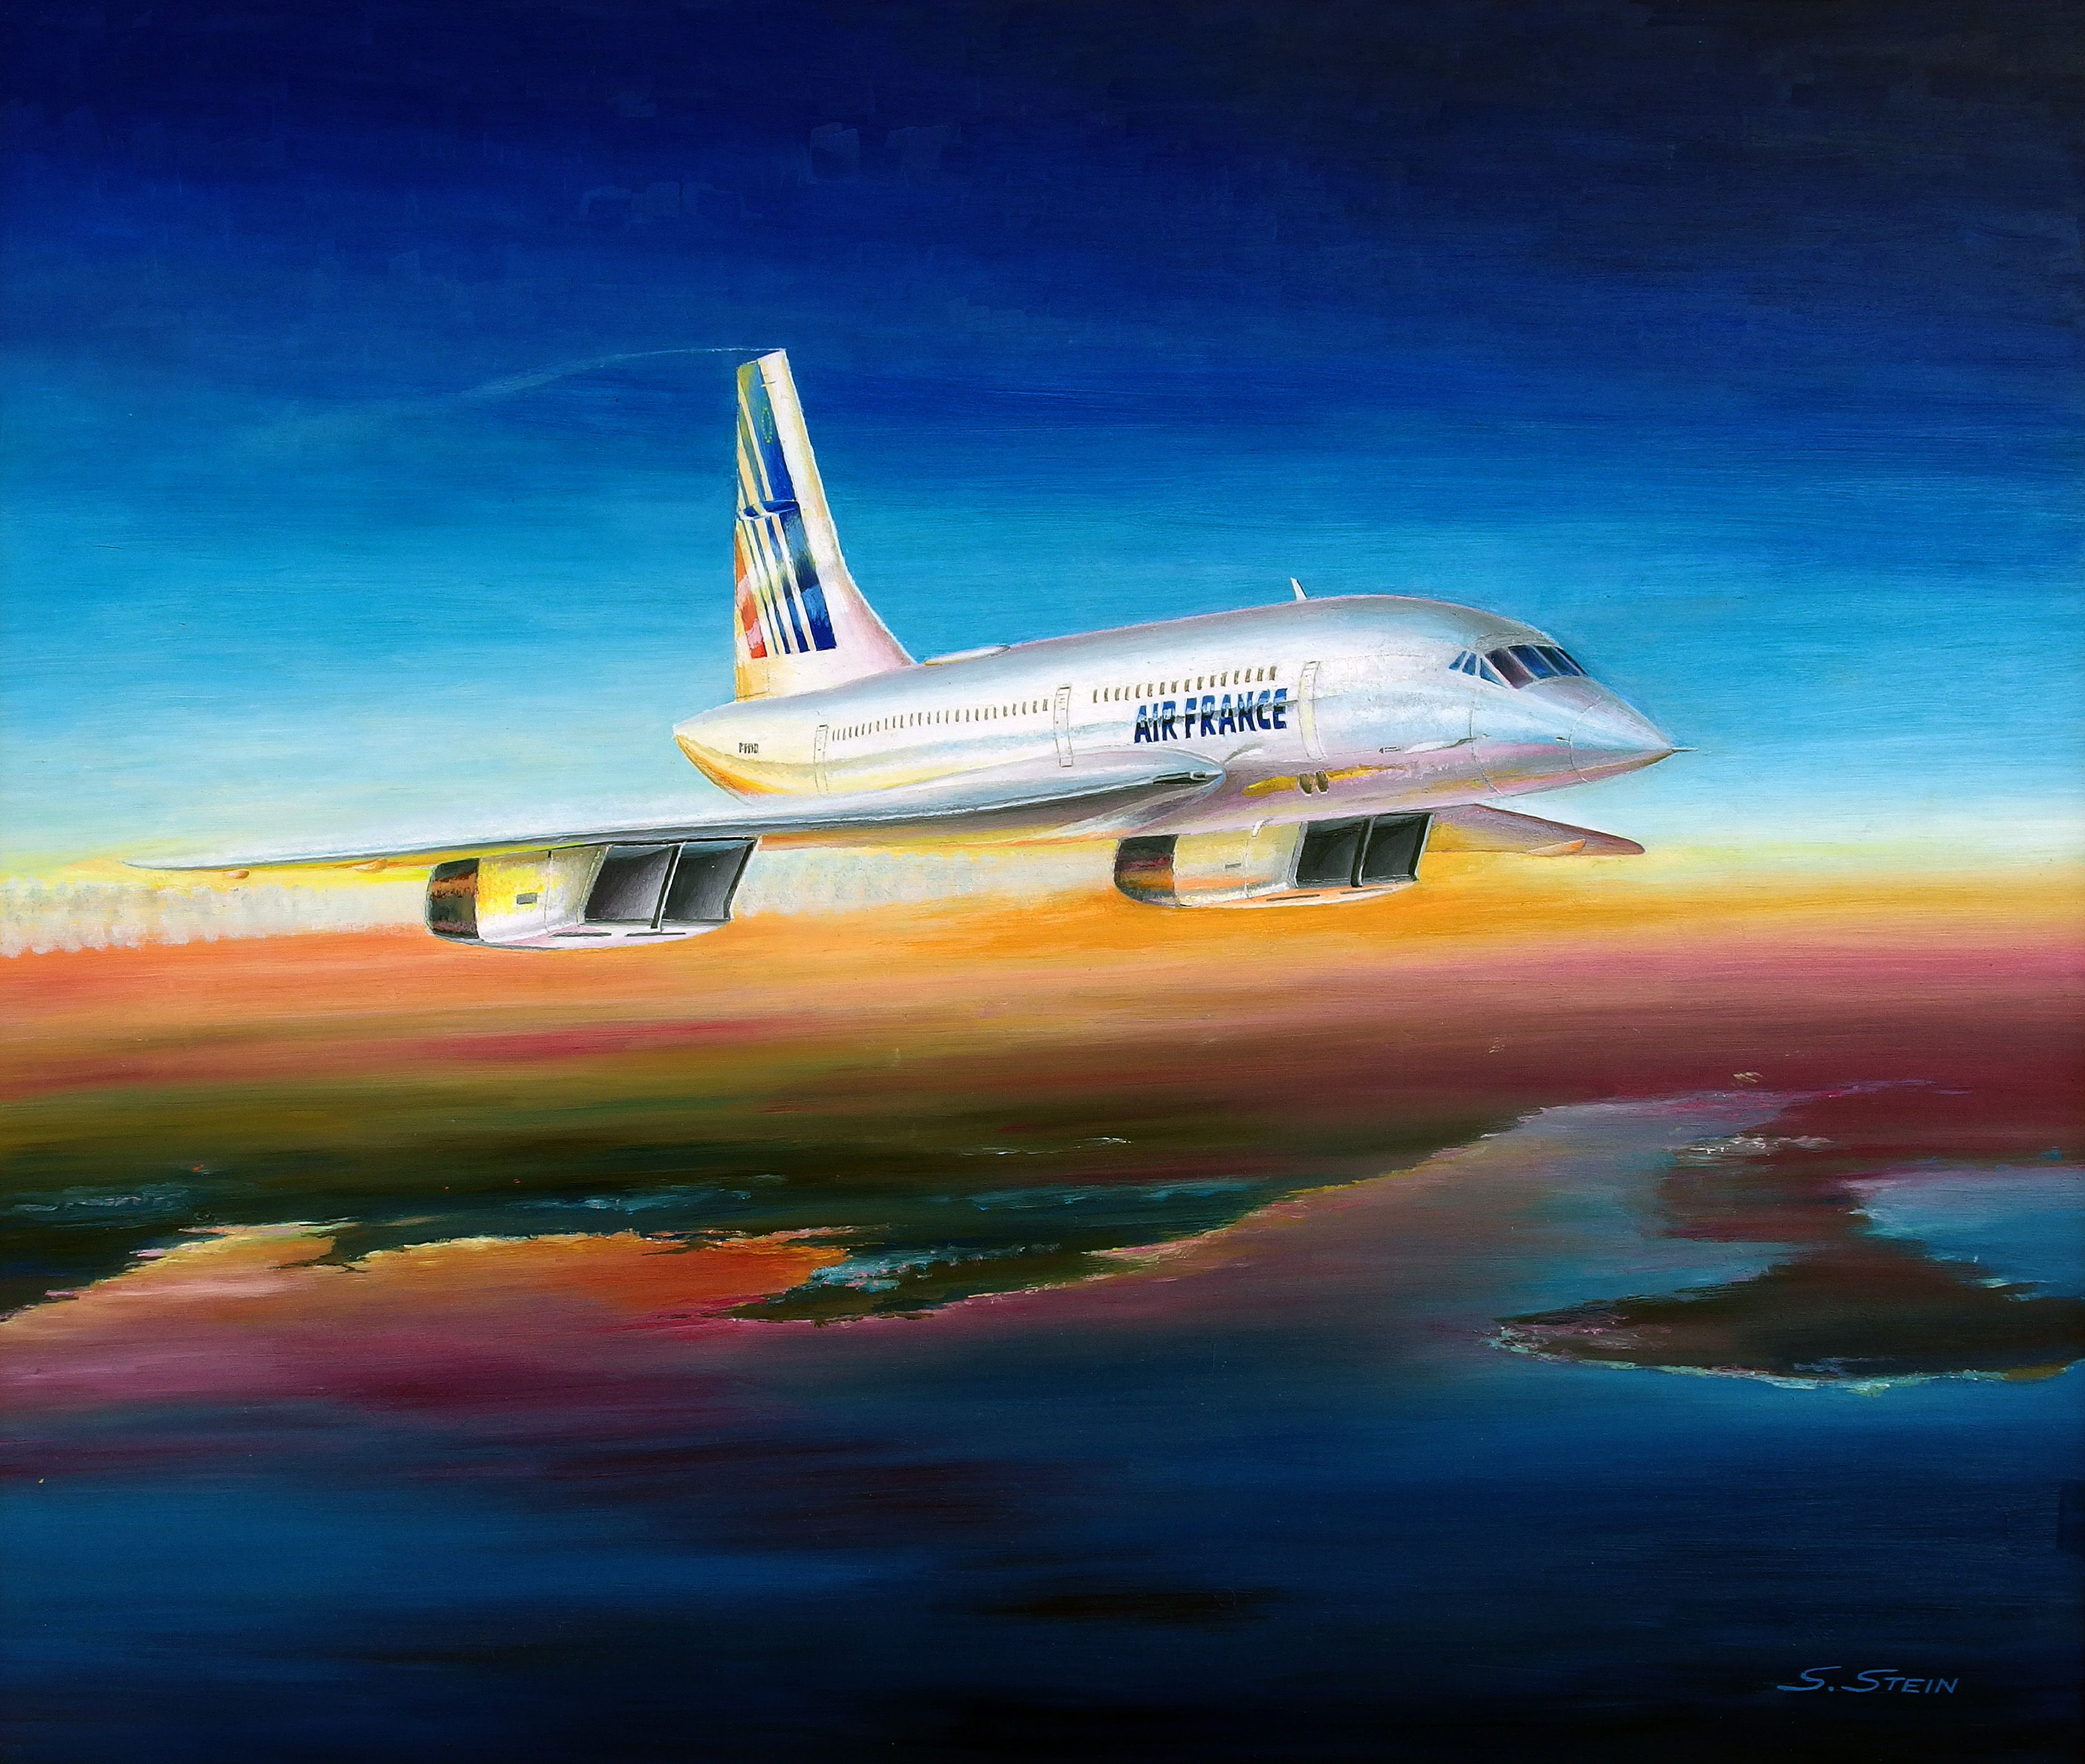 Concorde F-BTSD (Seriennr.:213)